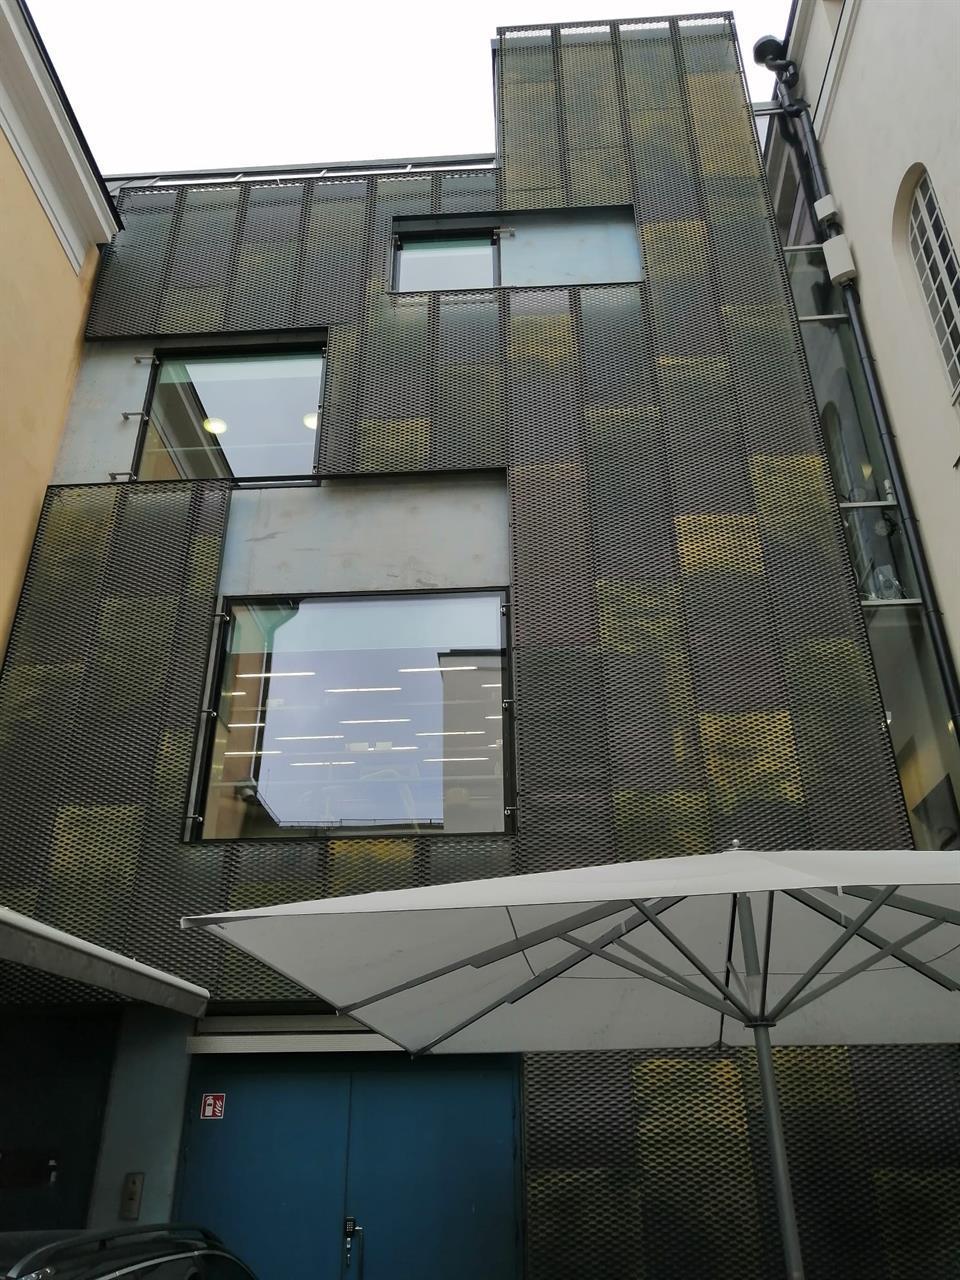 Helsingin kaupungin museo patinoitu kupari